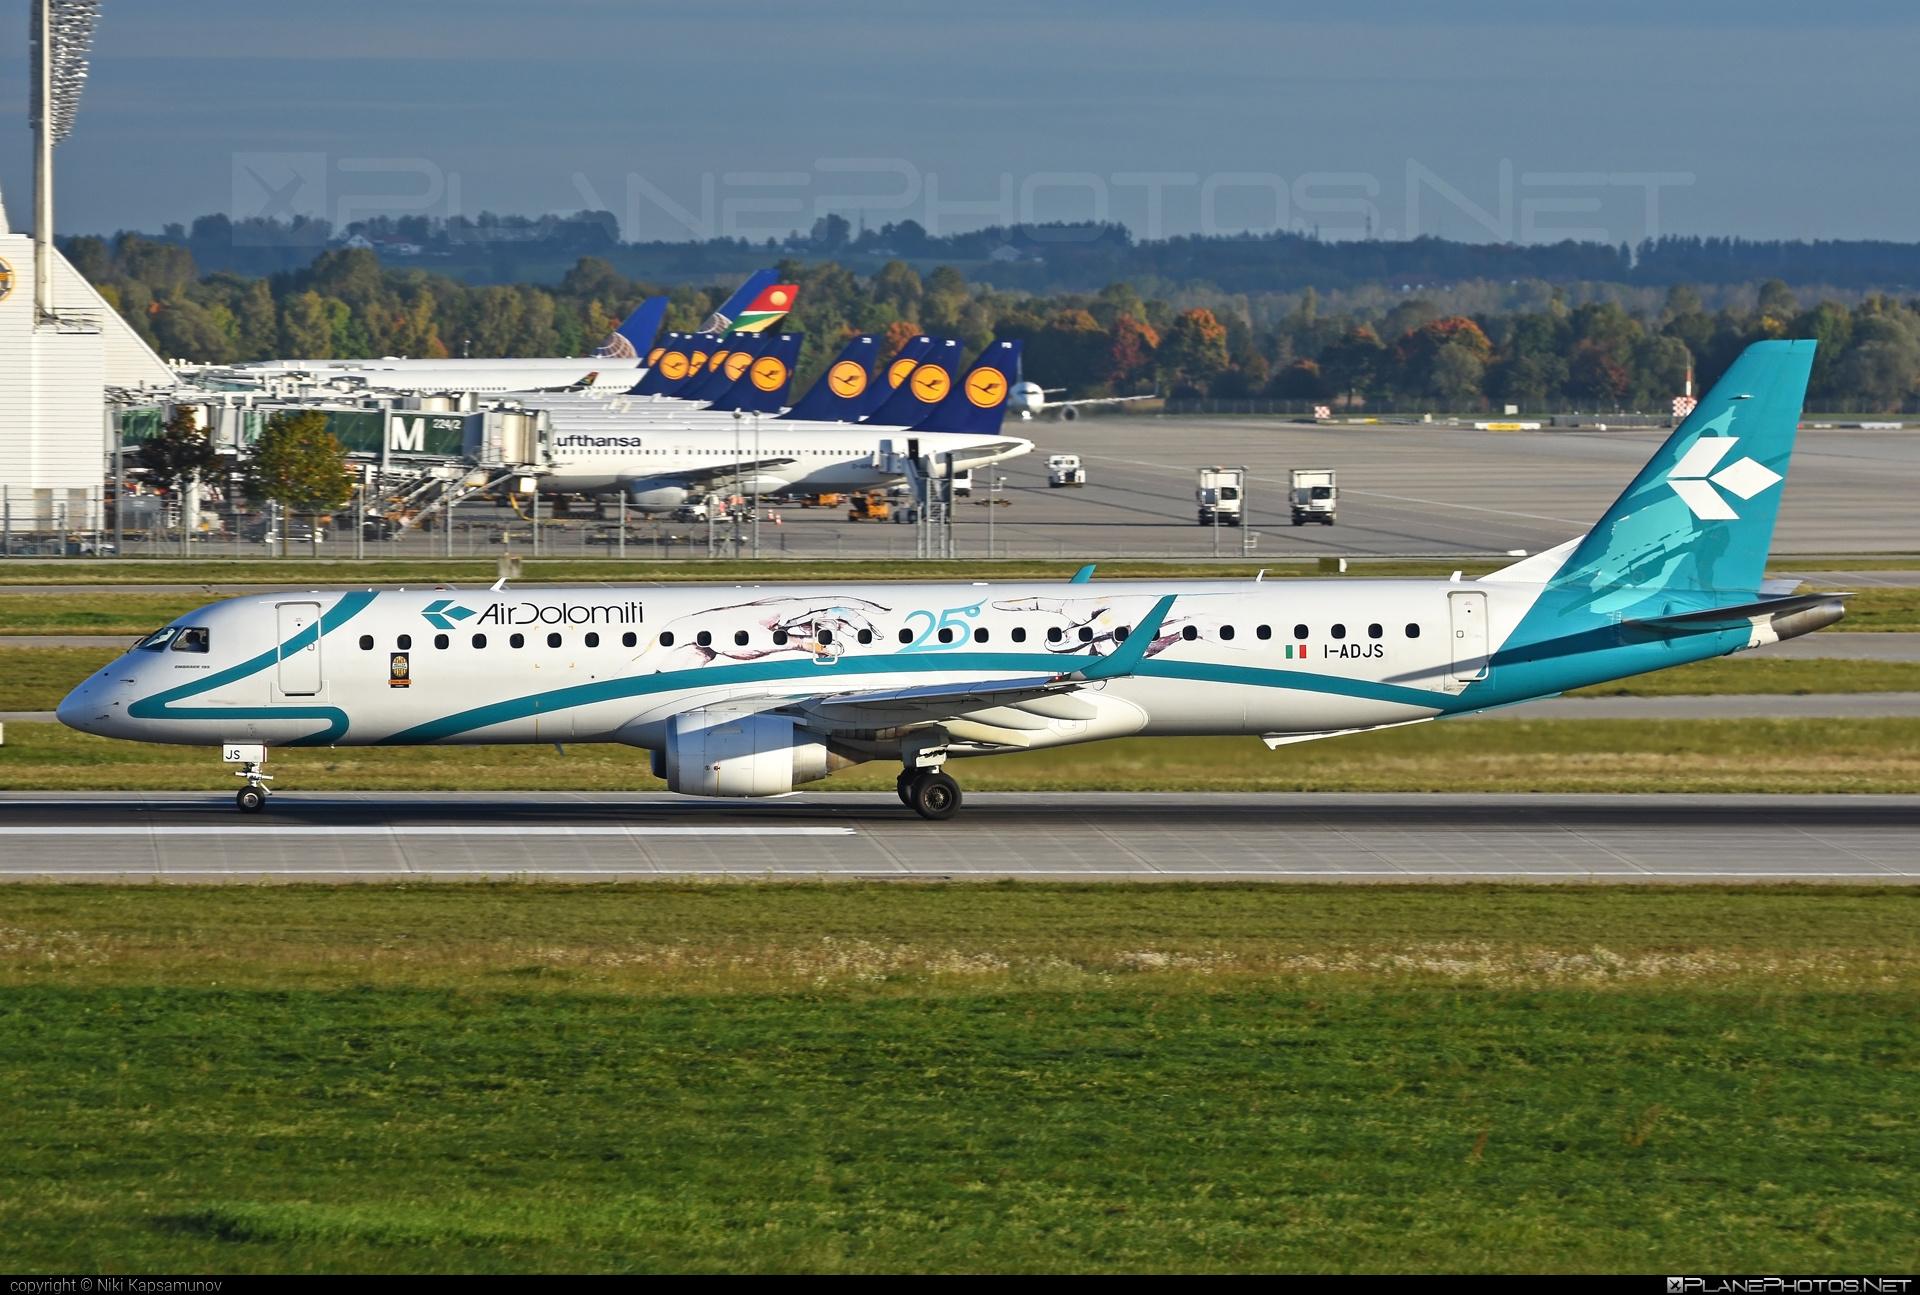 Embraer E195LR (ERJ-190-200LR) - I-ADJS operated by Air Dolomiti #airdolomiti #e190 #e190200 #e190200lr #e195lr #embraer #embraer190200lr #embraer195 #embraer195lr